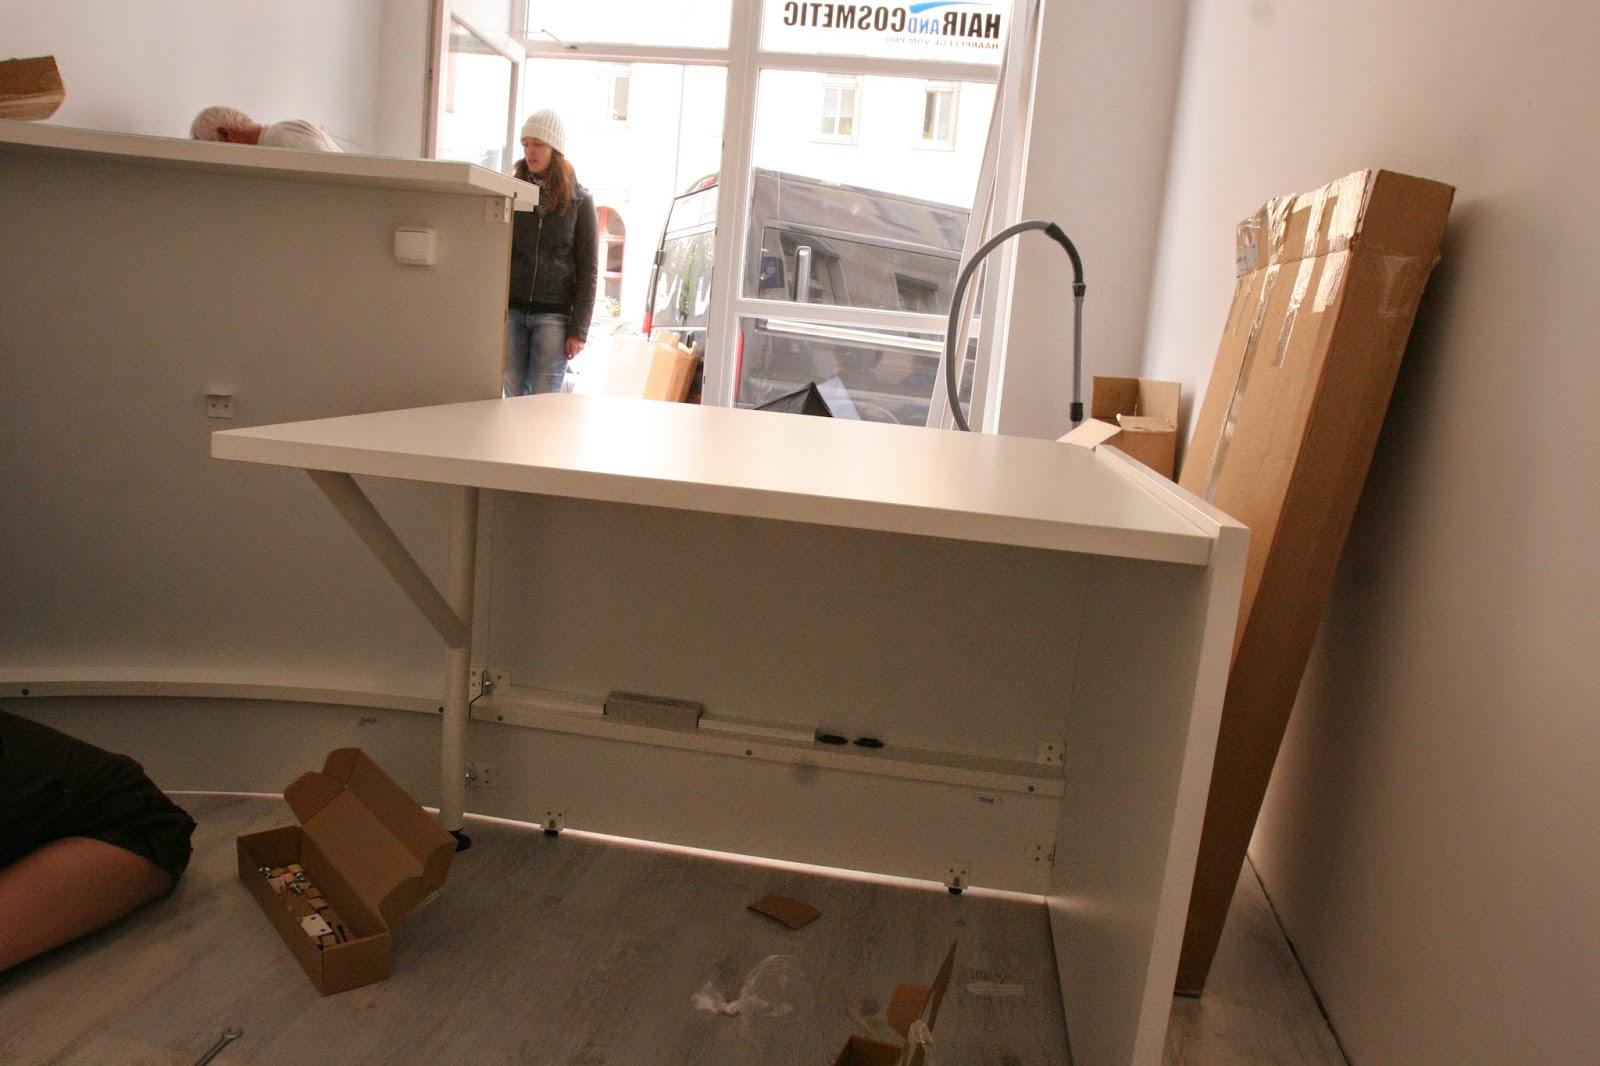 Büromöbel Günstig Kaufen | jamgo.co